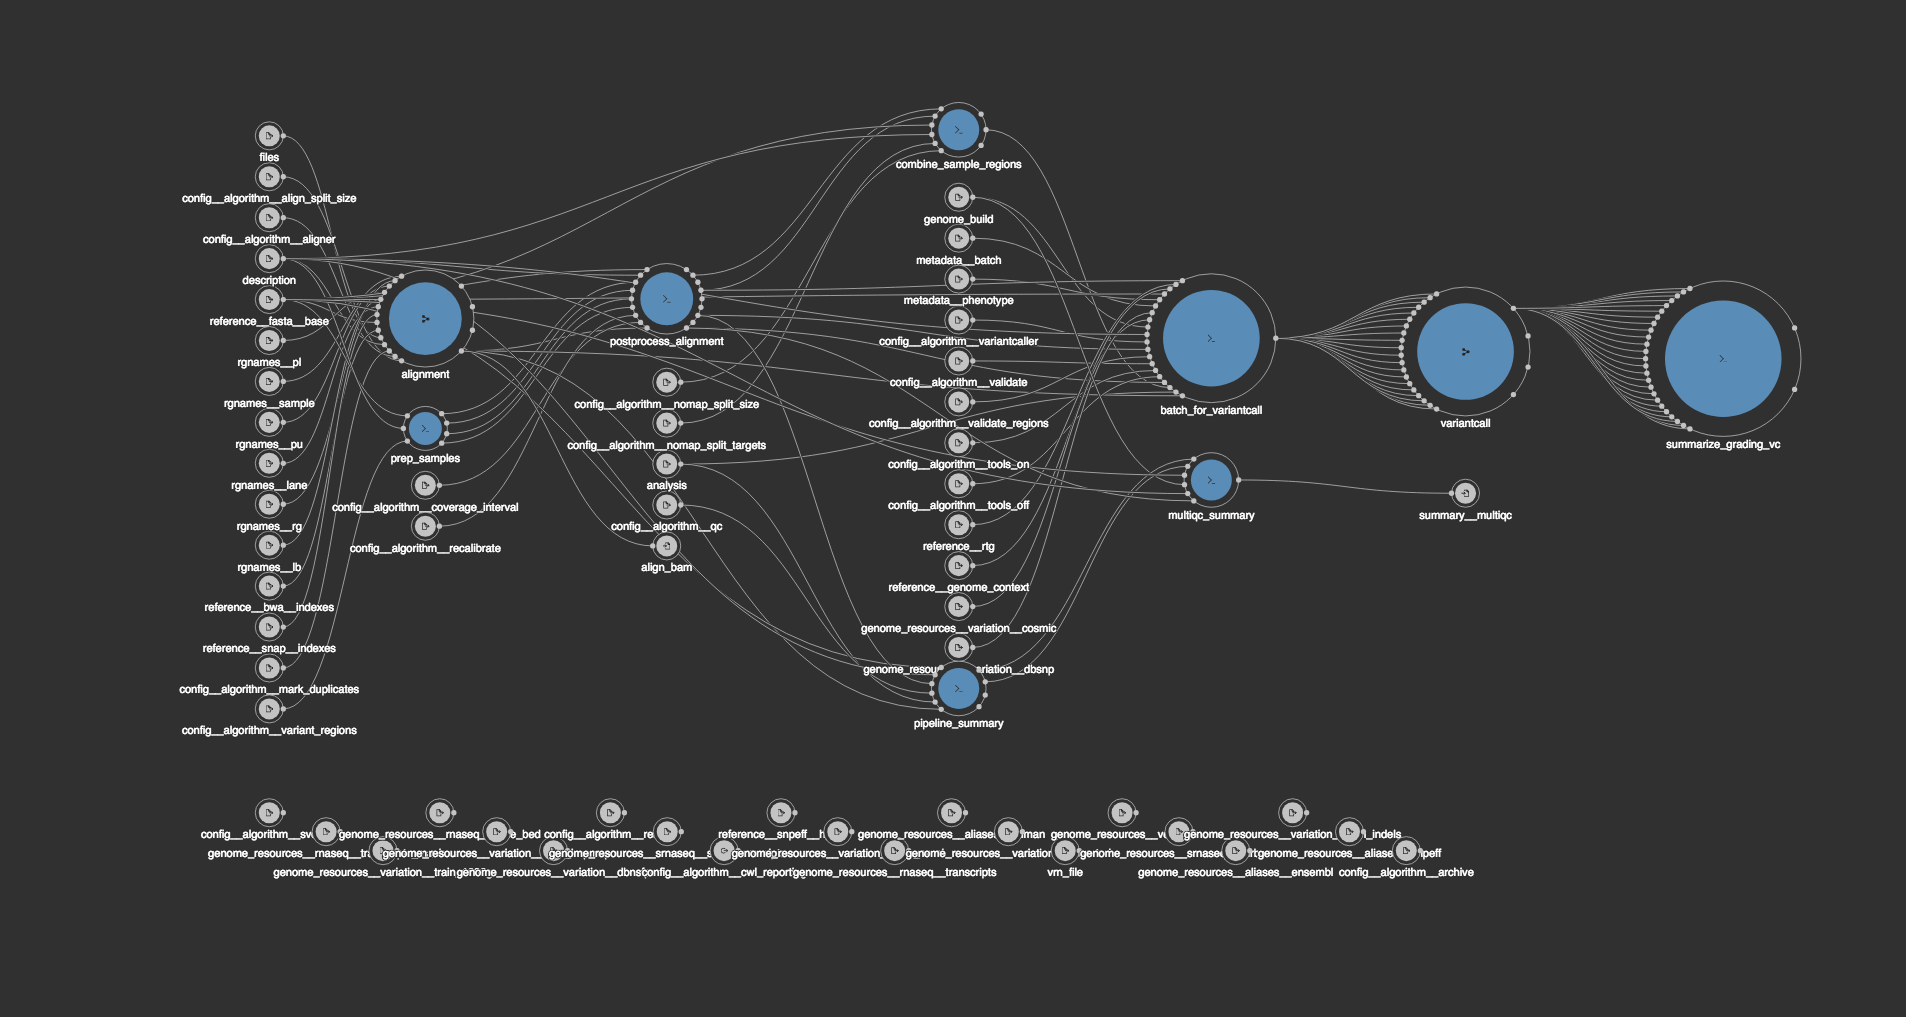 Arranged and scaled BCBio workflow